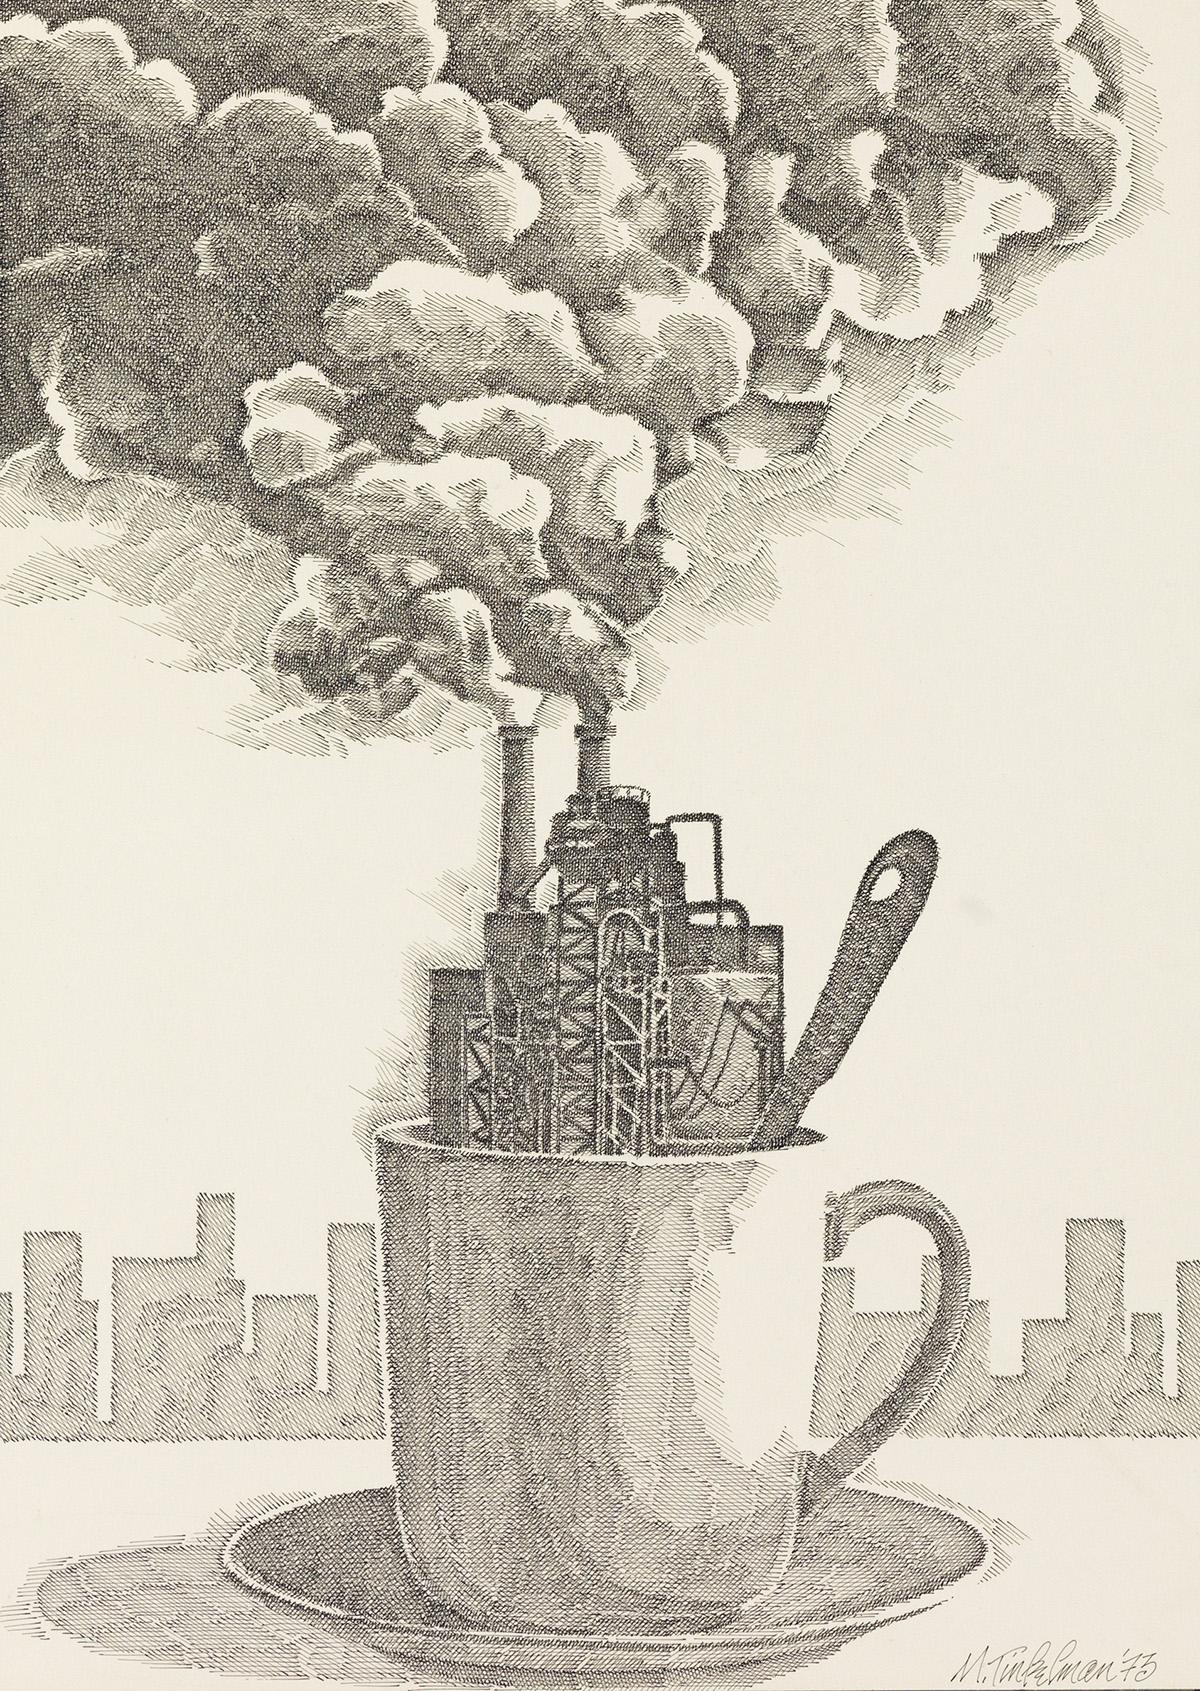 MURRAY-TINKELMAN-Industrial-Morning